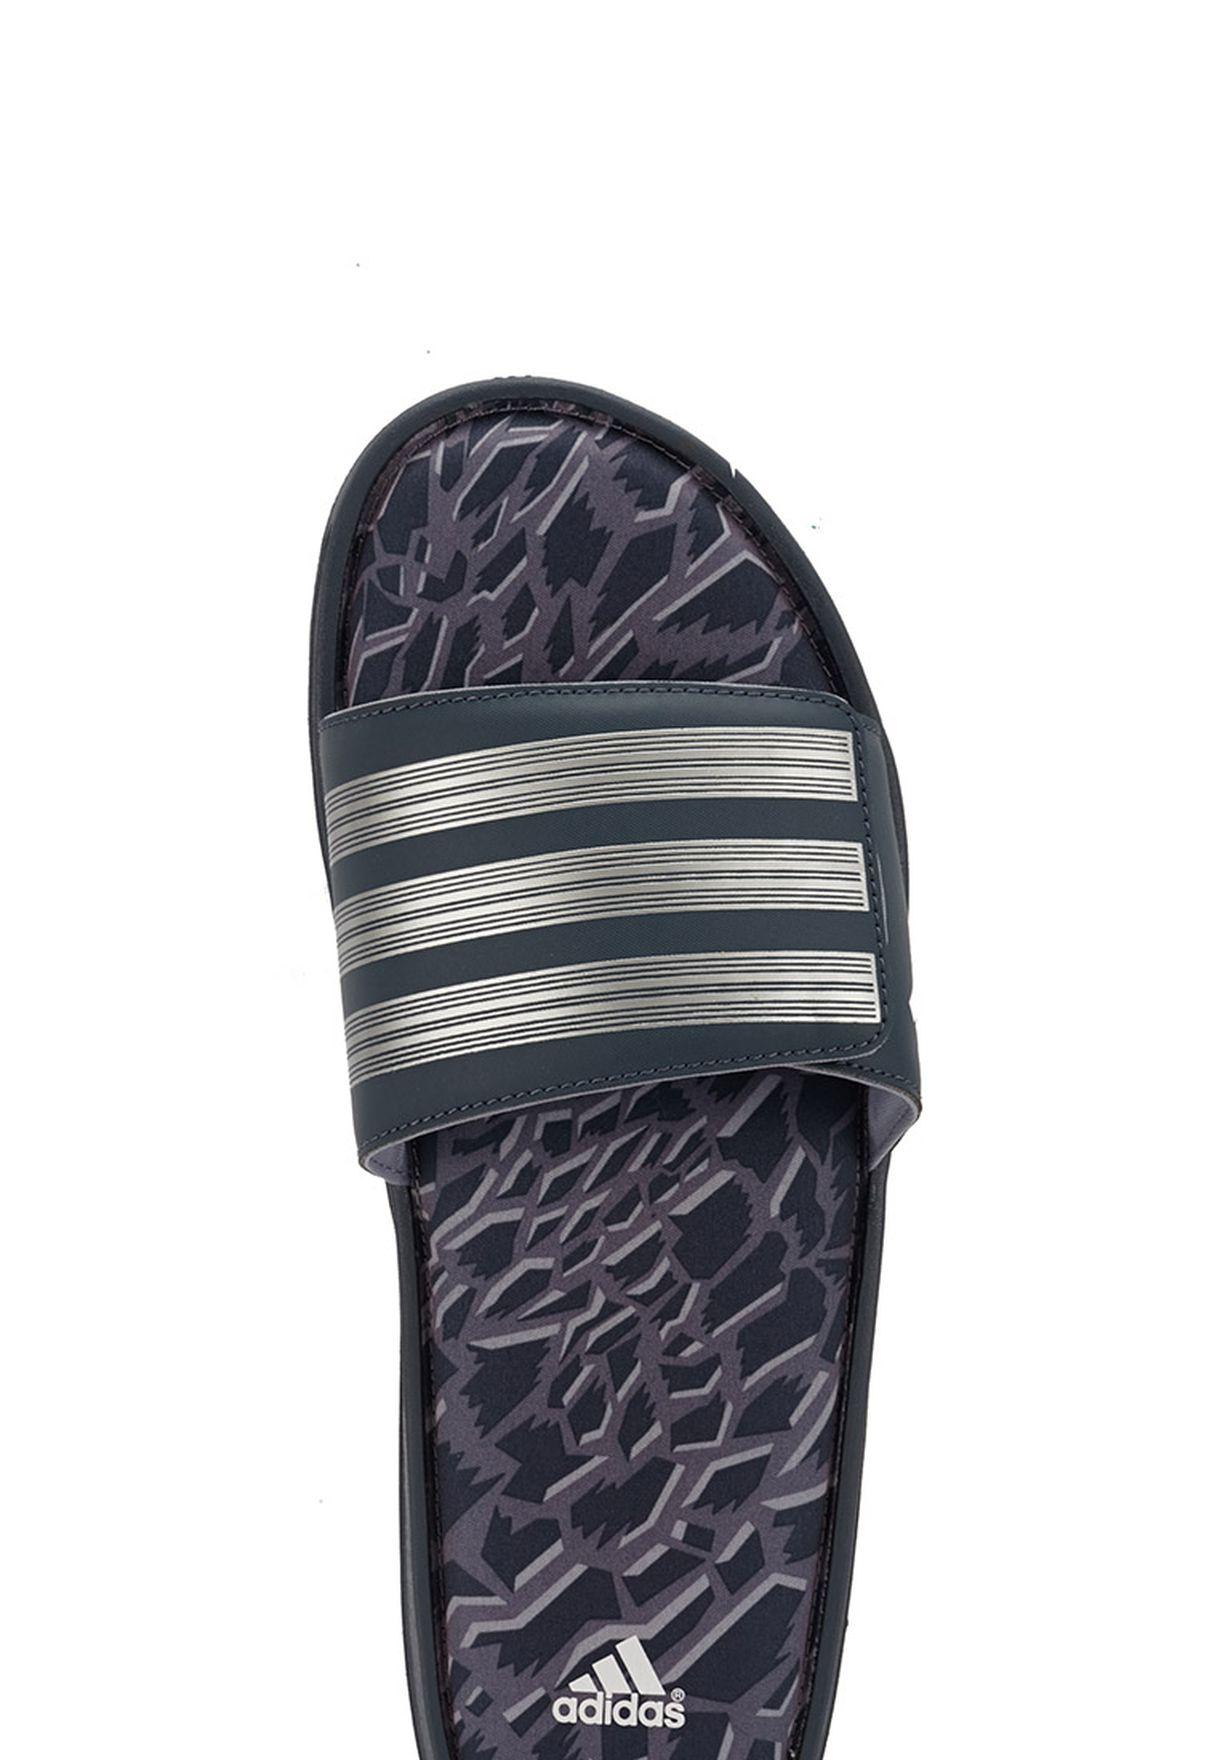 Herrenschuhe Adidas Realfoam Vario Gr M G97783 Sandalen Gr